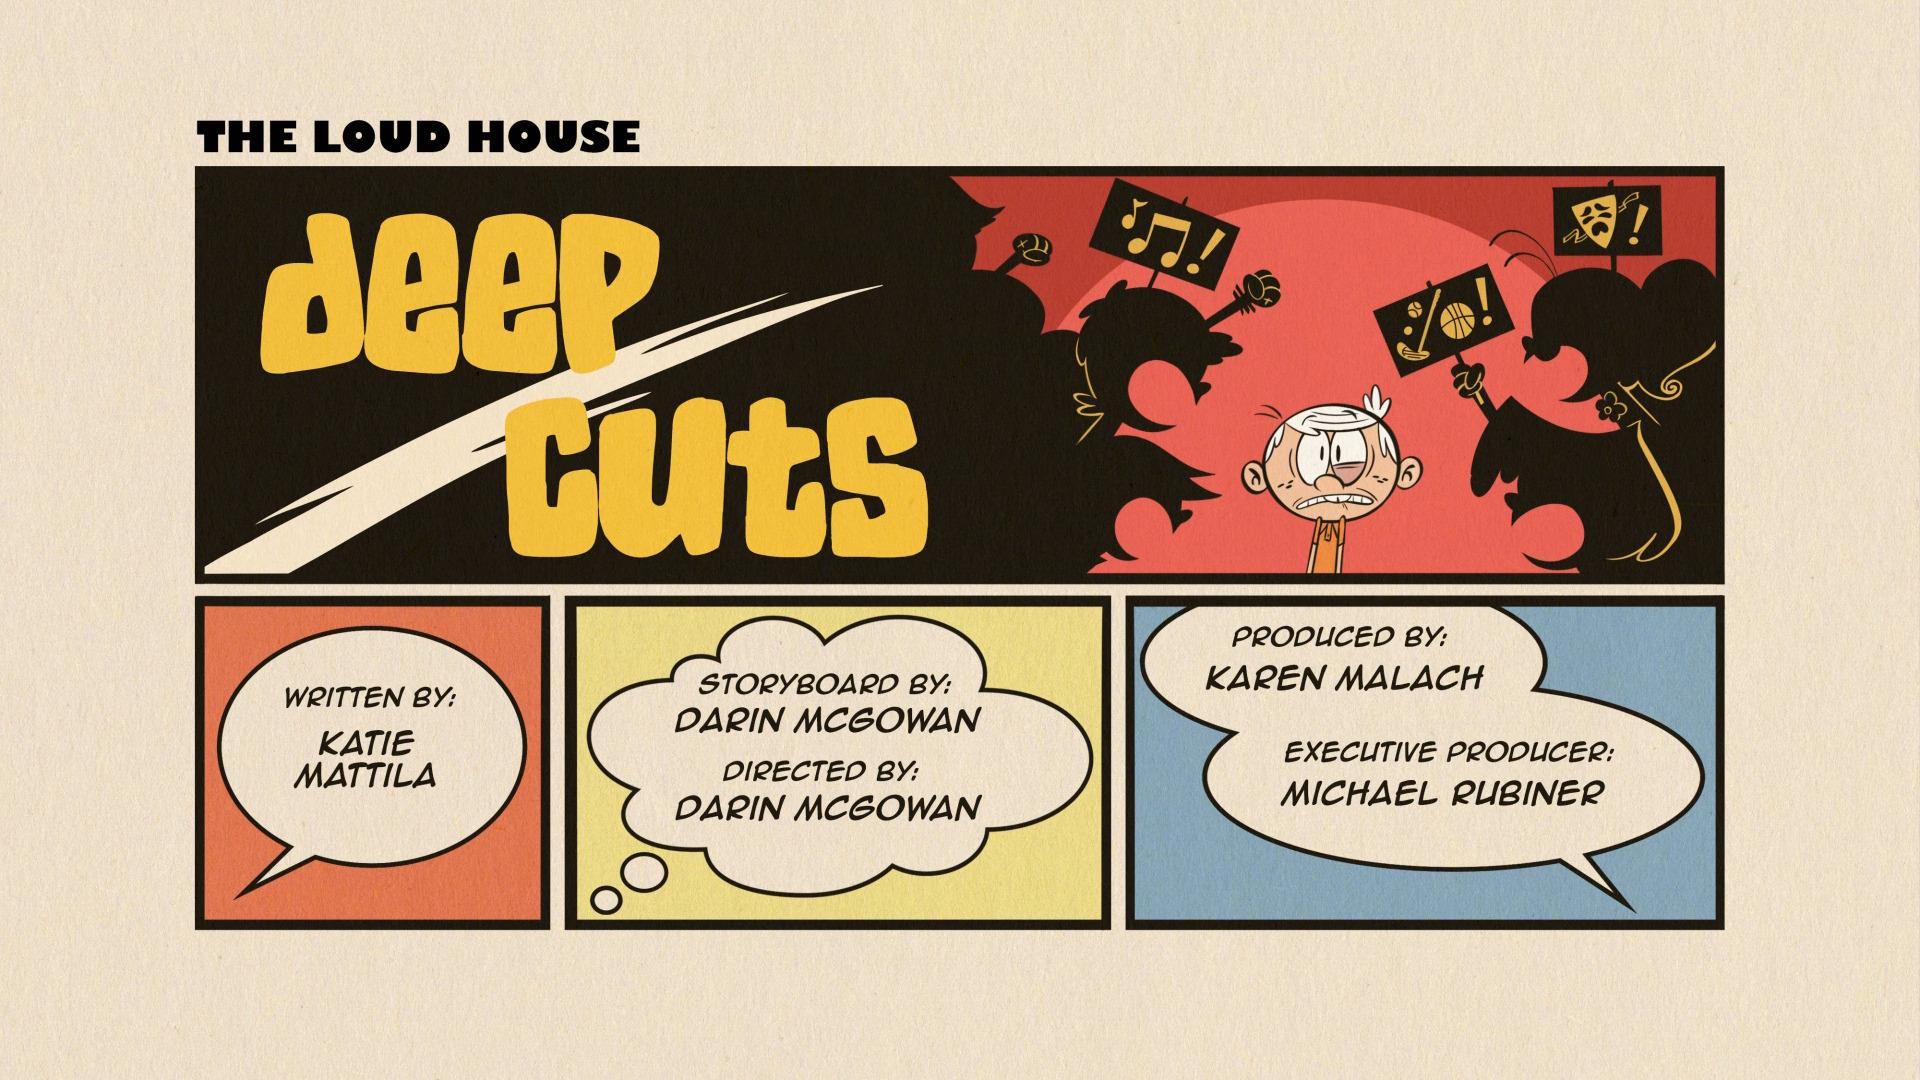 Deep Cuts The Loud House Encyclopedia Fandom